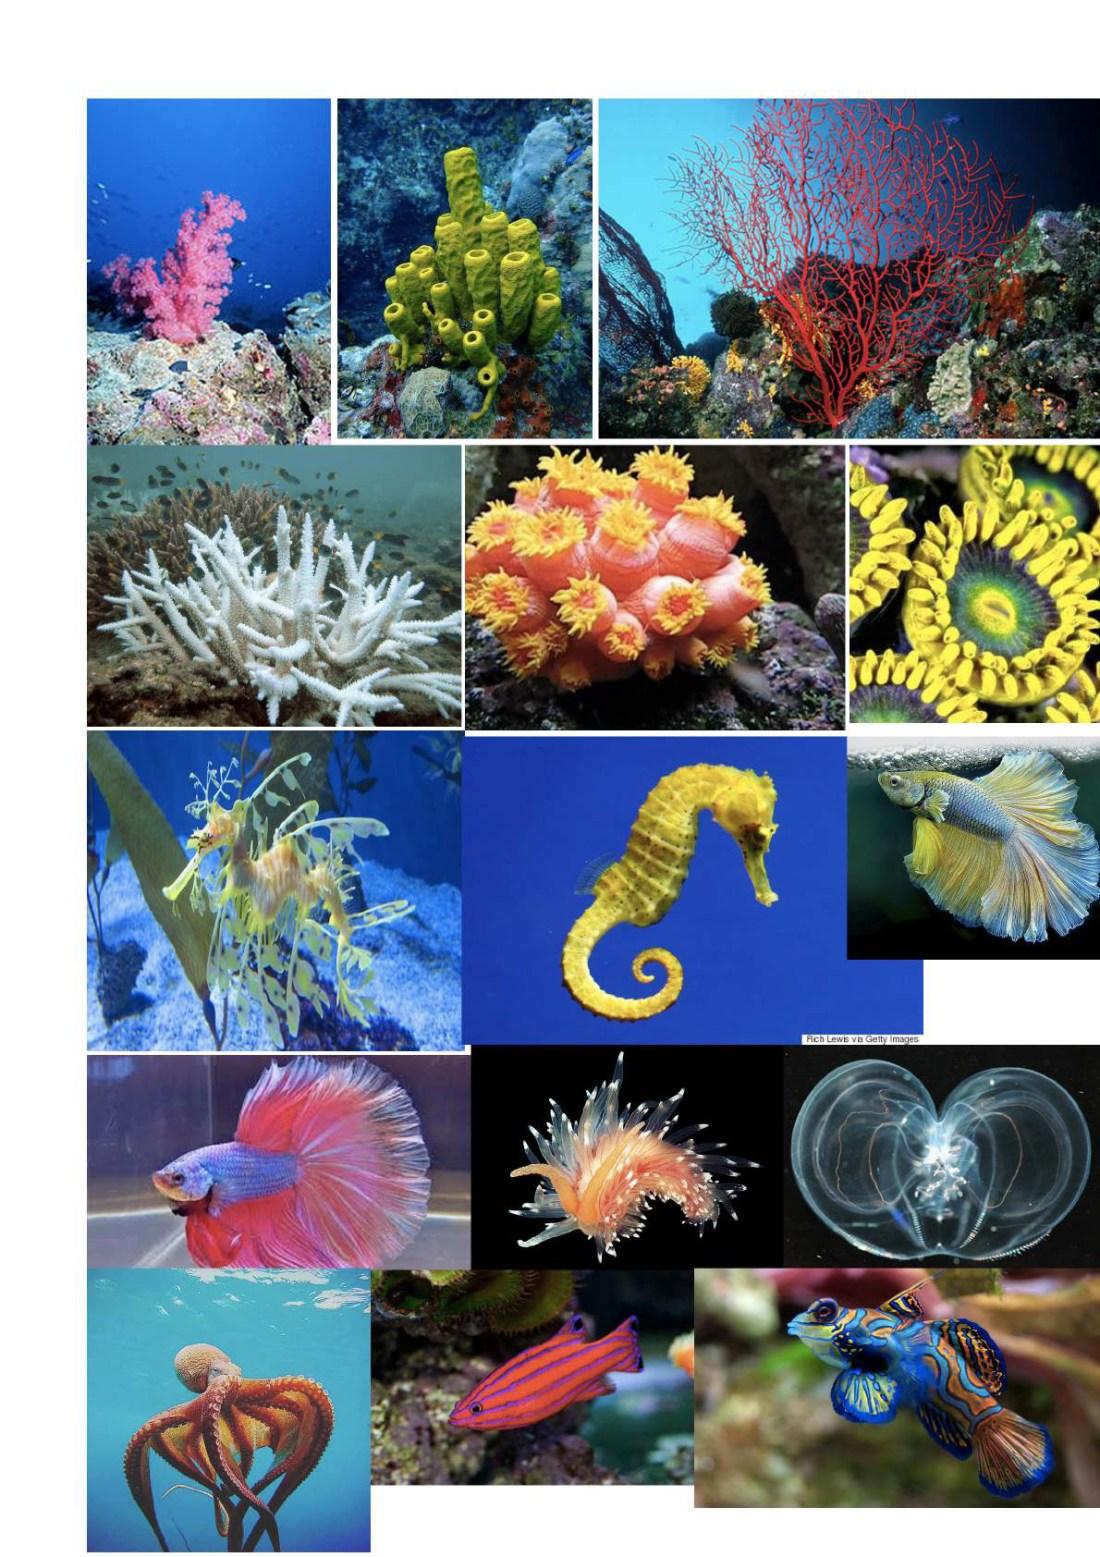 Underwater Inspiration images